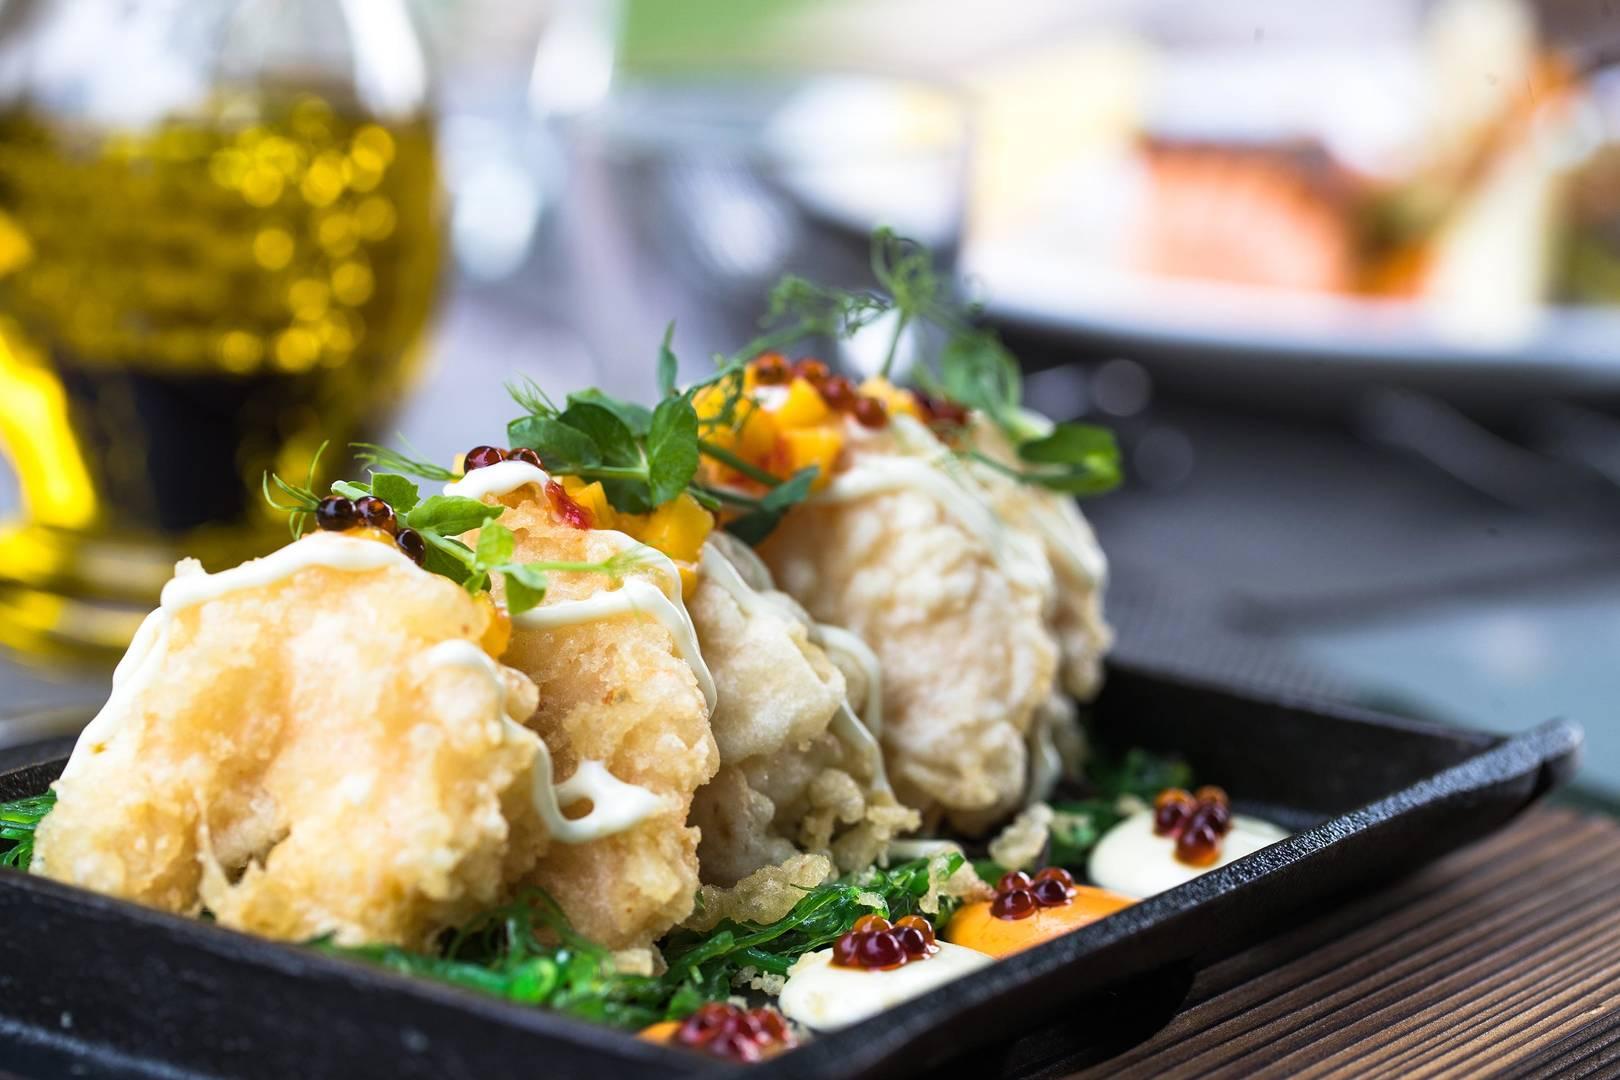 https://cdn.jumeirah.com/-/mediadh/DH/Hospitality/Jumeirah/Restaurants/Dubai/Creekside-Hotel-Nomad/Restaurant-Gallery/JumeirahCreeksideHotelNomad464.jpg?h=1080&w=1620&hash=DBB16E2D6D91D3AF572FD9828A712496